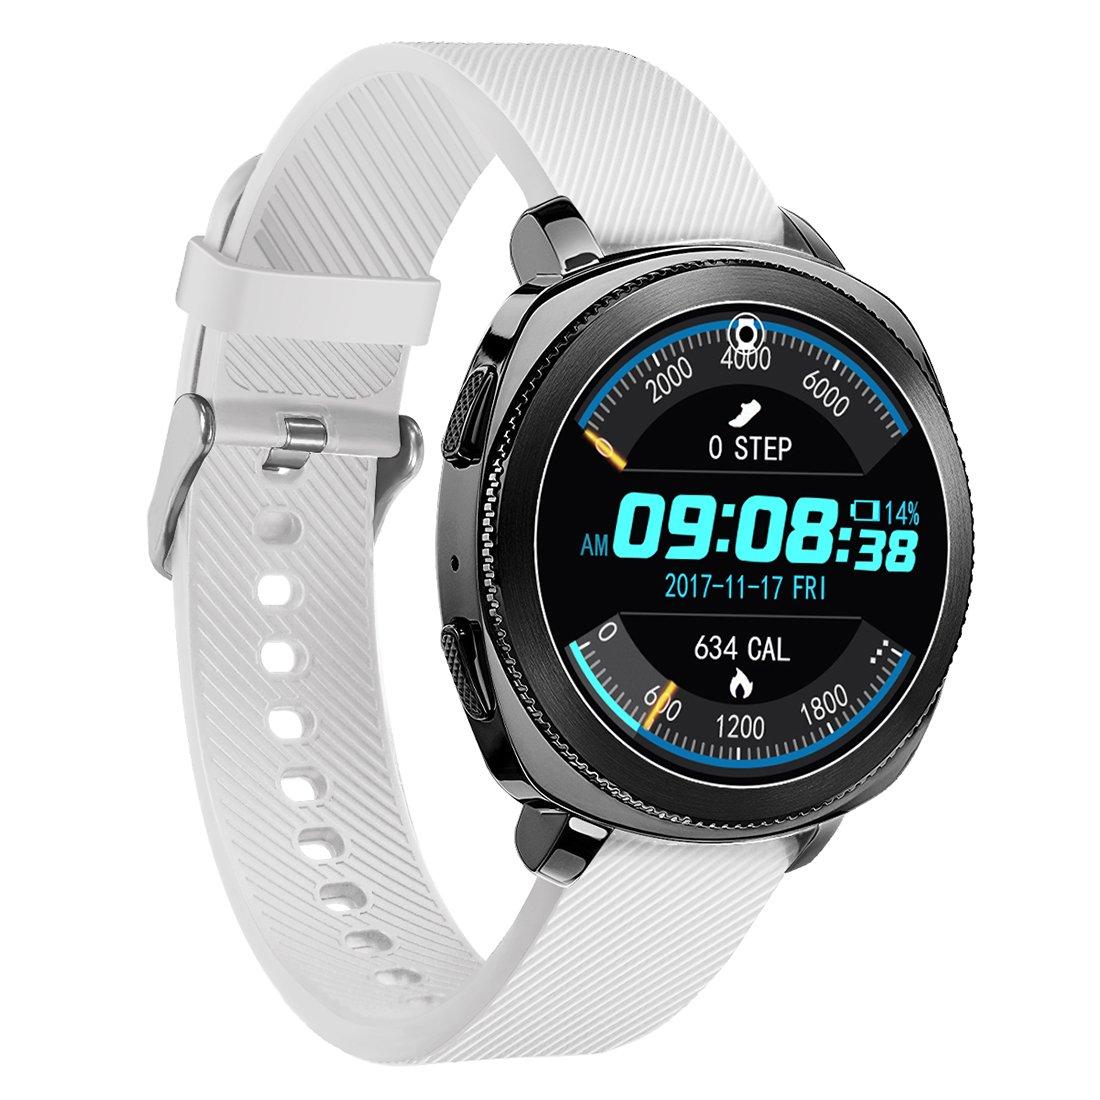 Amazon.com: Ticwatch 2 E Classic Watch Band 20mm ...